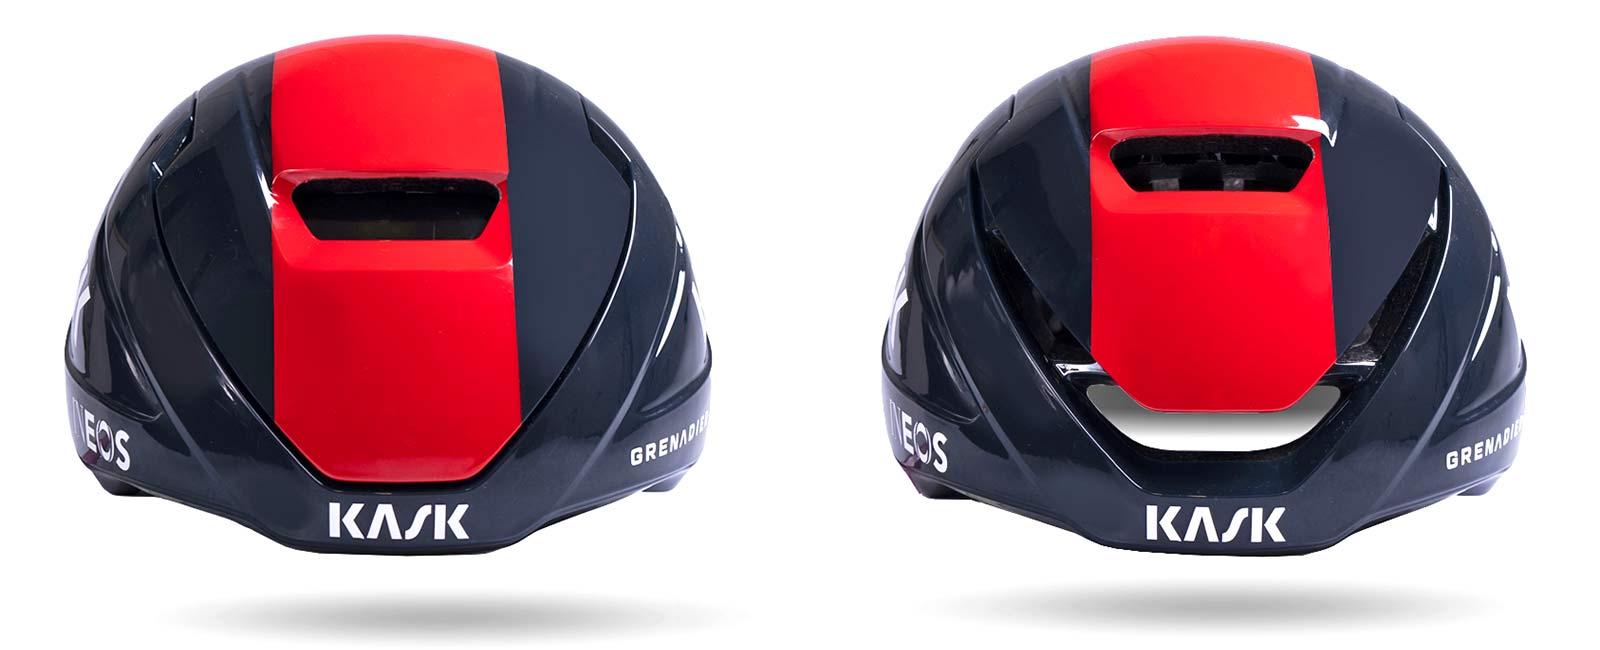 Kask Wasabi aero road helmet, adjustable venting aerodynamics merino padding, open vs. closed